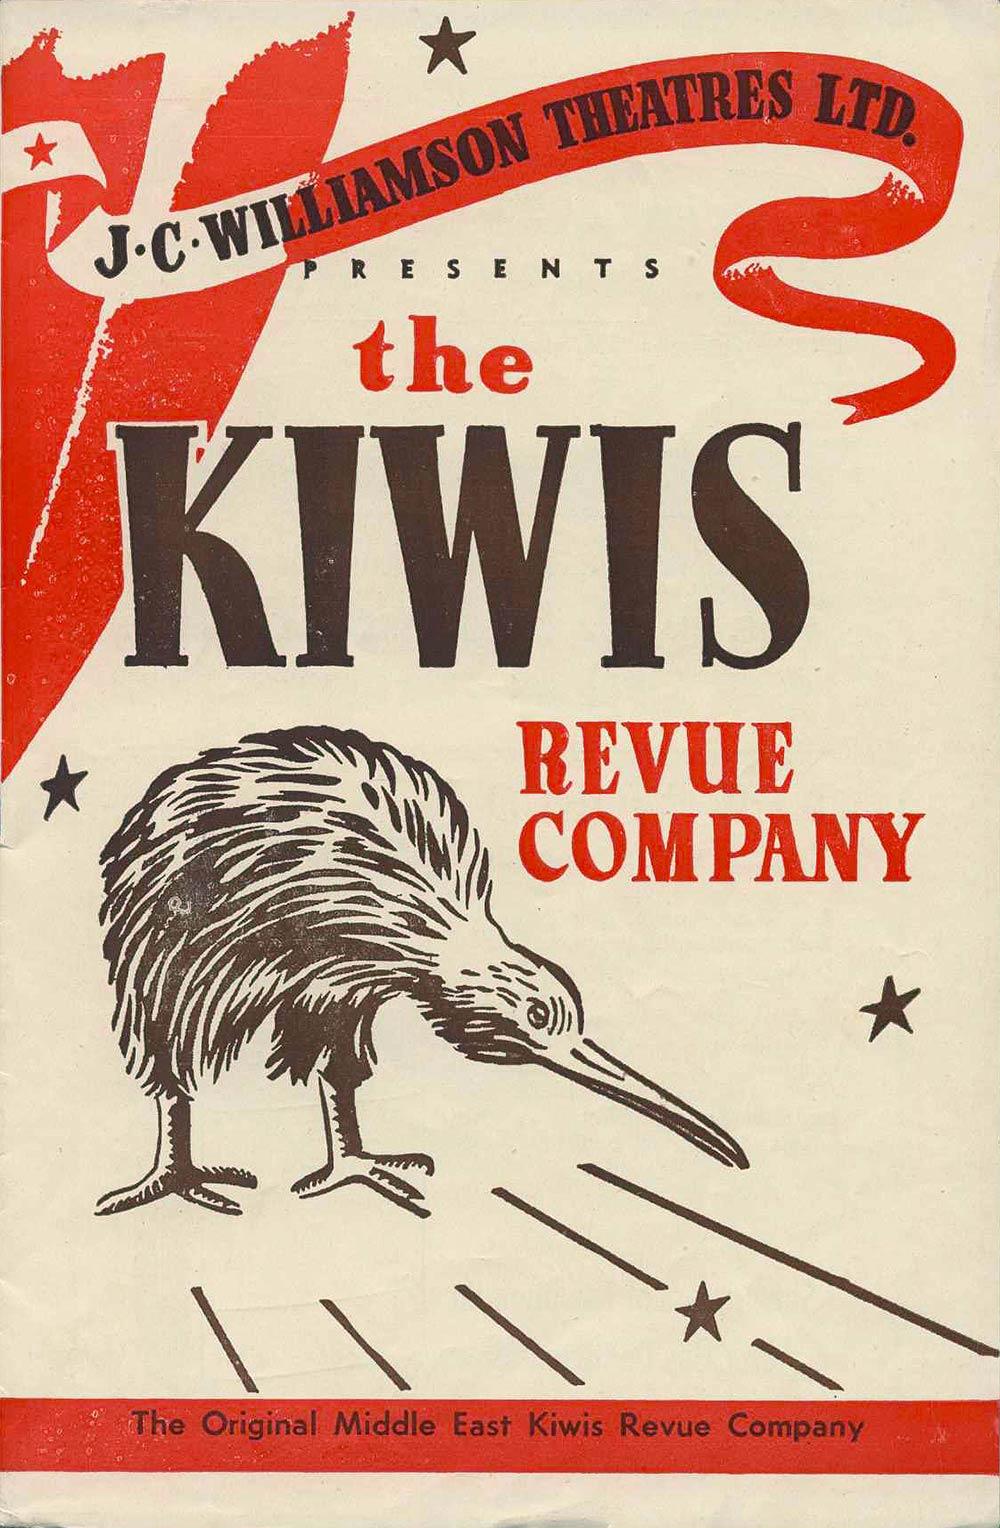 <em>The Kiwis Revue Company</em>. (J.C. Williamson Theatres Ltd.). His Majesty's Theatre, Dunedin, Nov. 7, 1953.